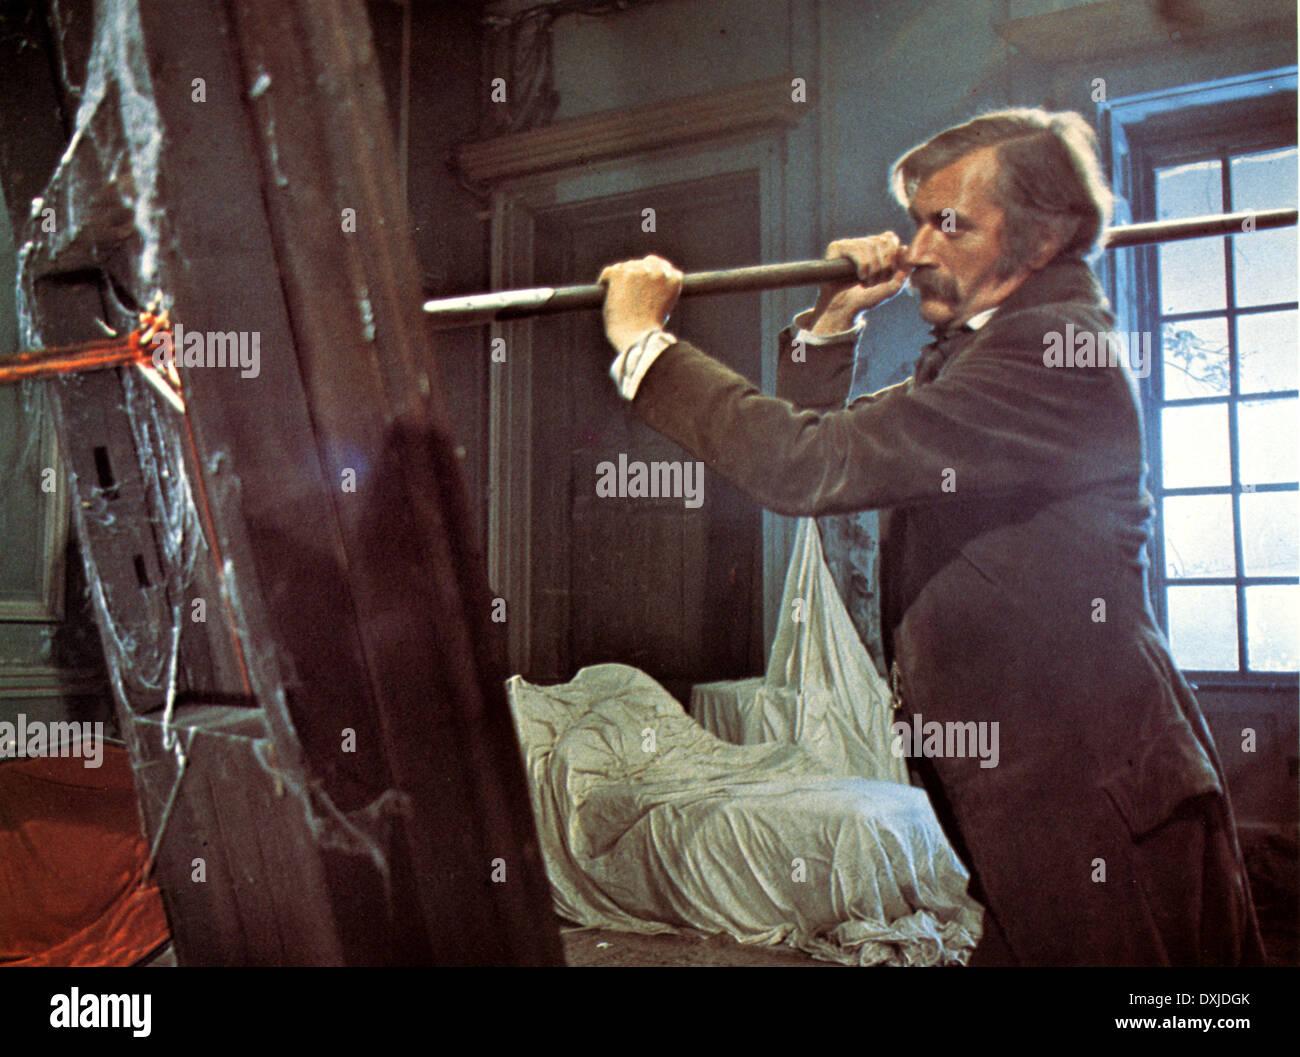 DRACULA (UK TVM 1973) DAN CURTIS PRODUCTIONS NIGEL DAVENPORT - Stock Image